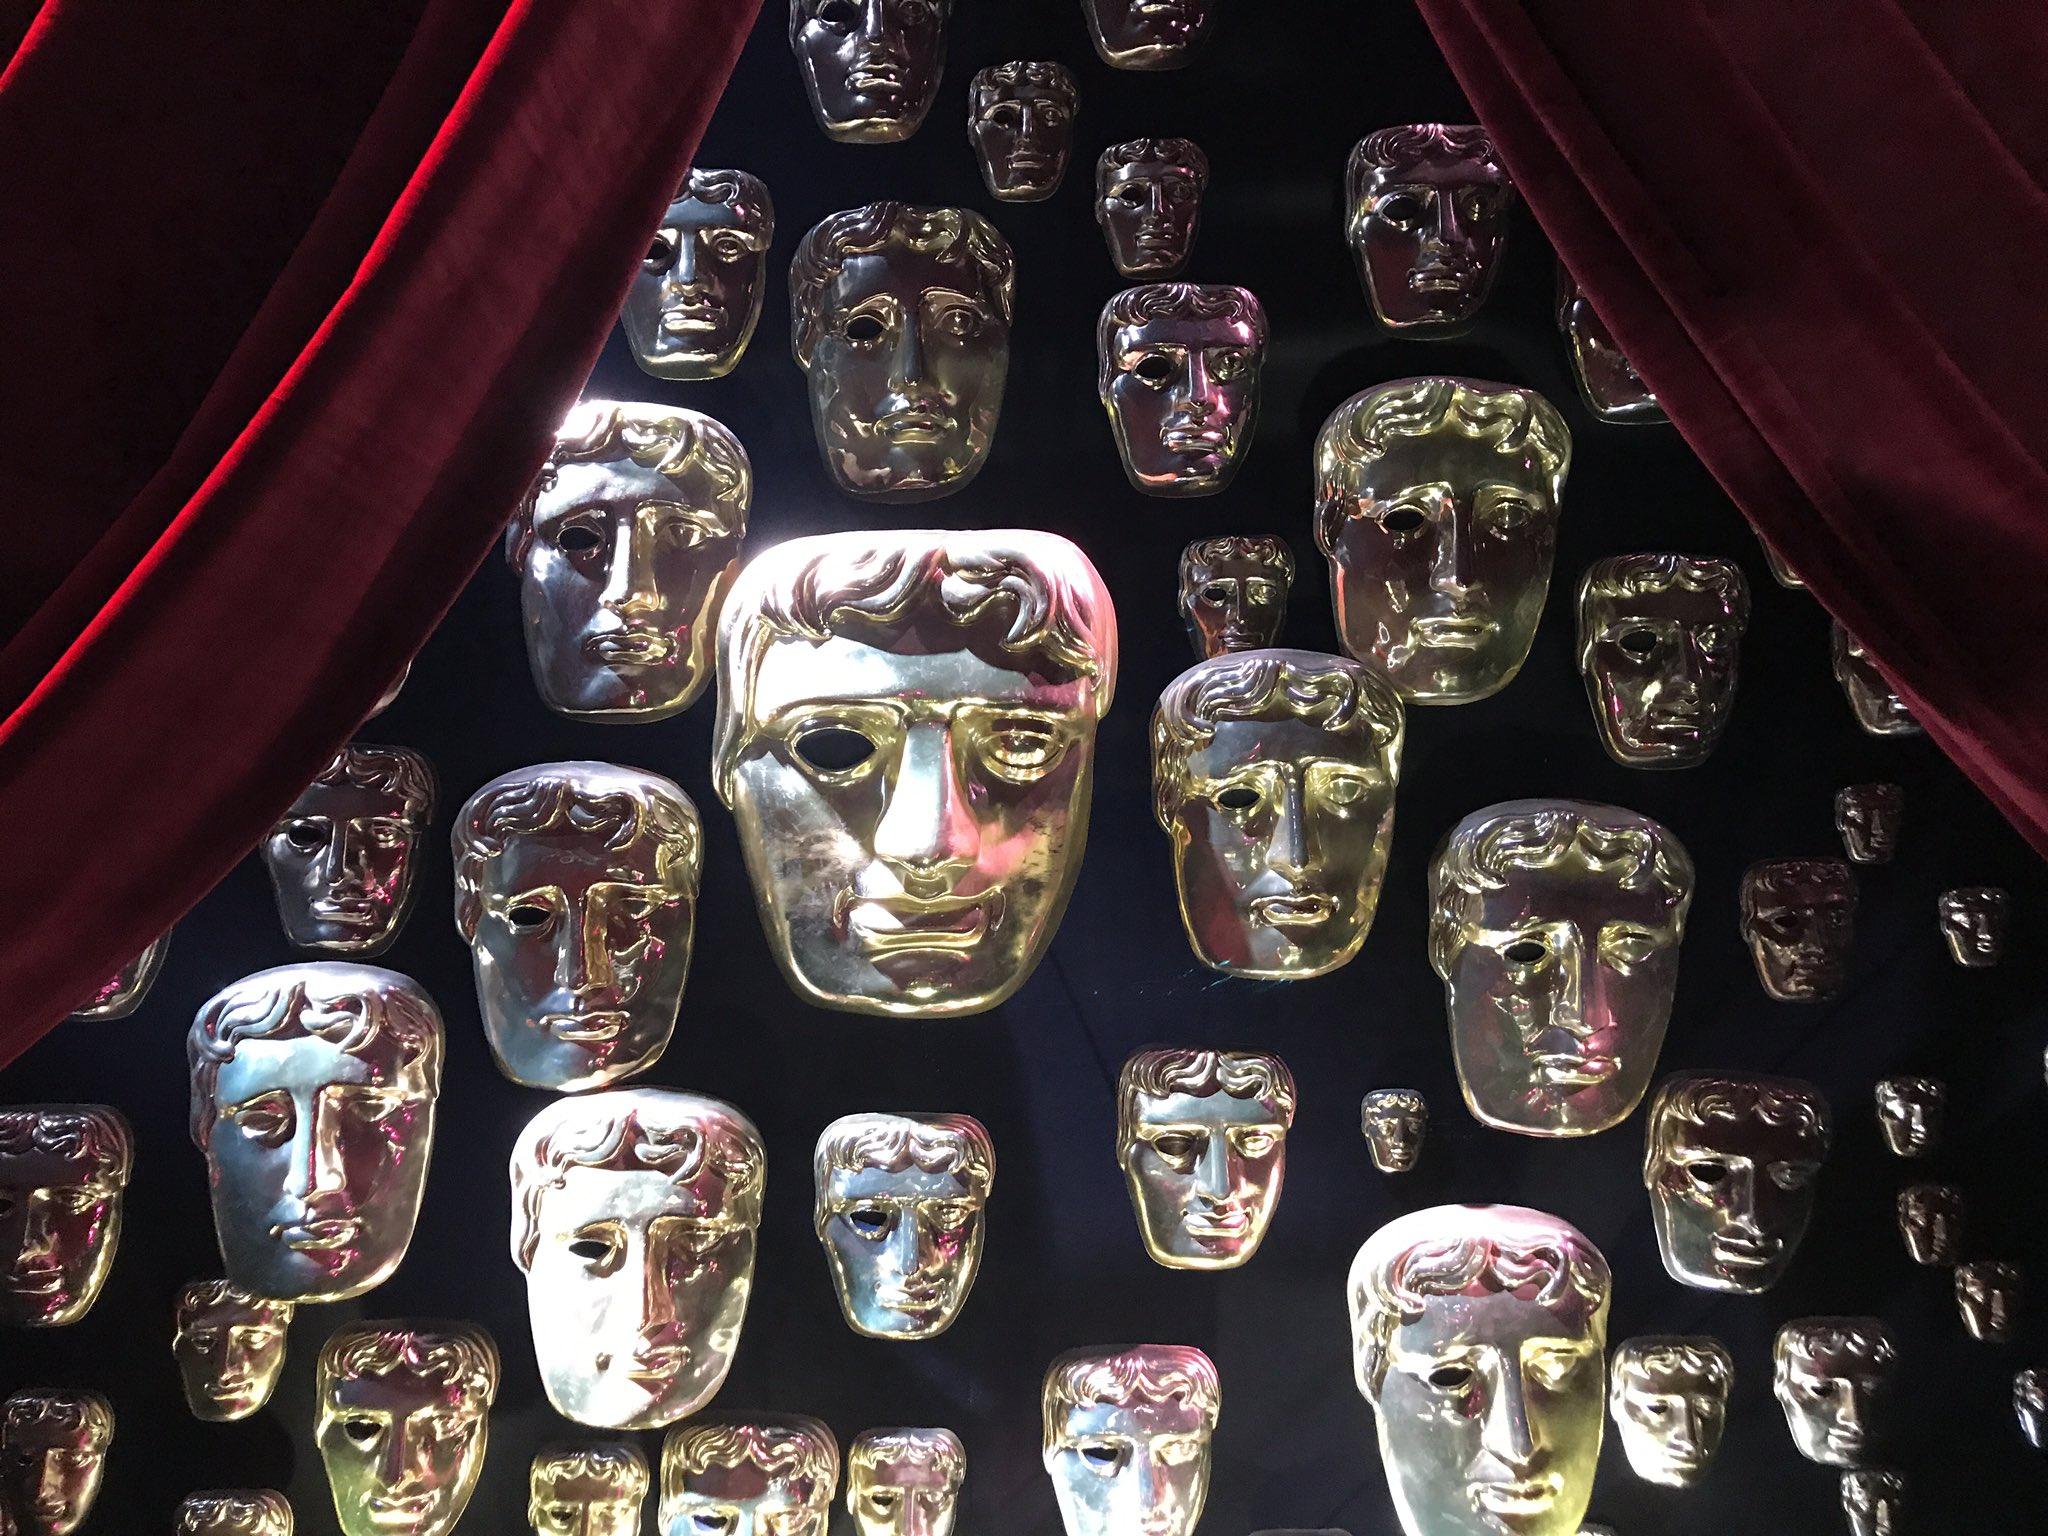 I am Baftacus. No, I am Baftacus. I am Baftacus … etc #BAFTAs https://t.co/RajpXSHnyb